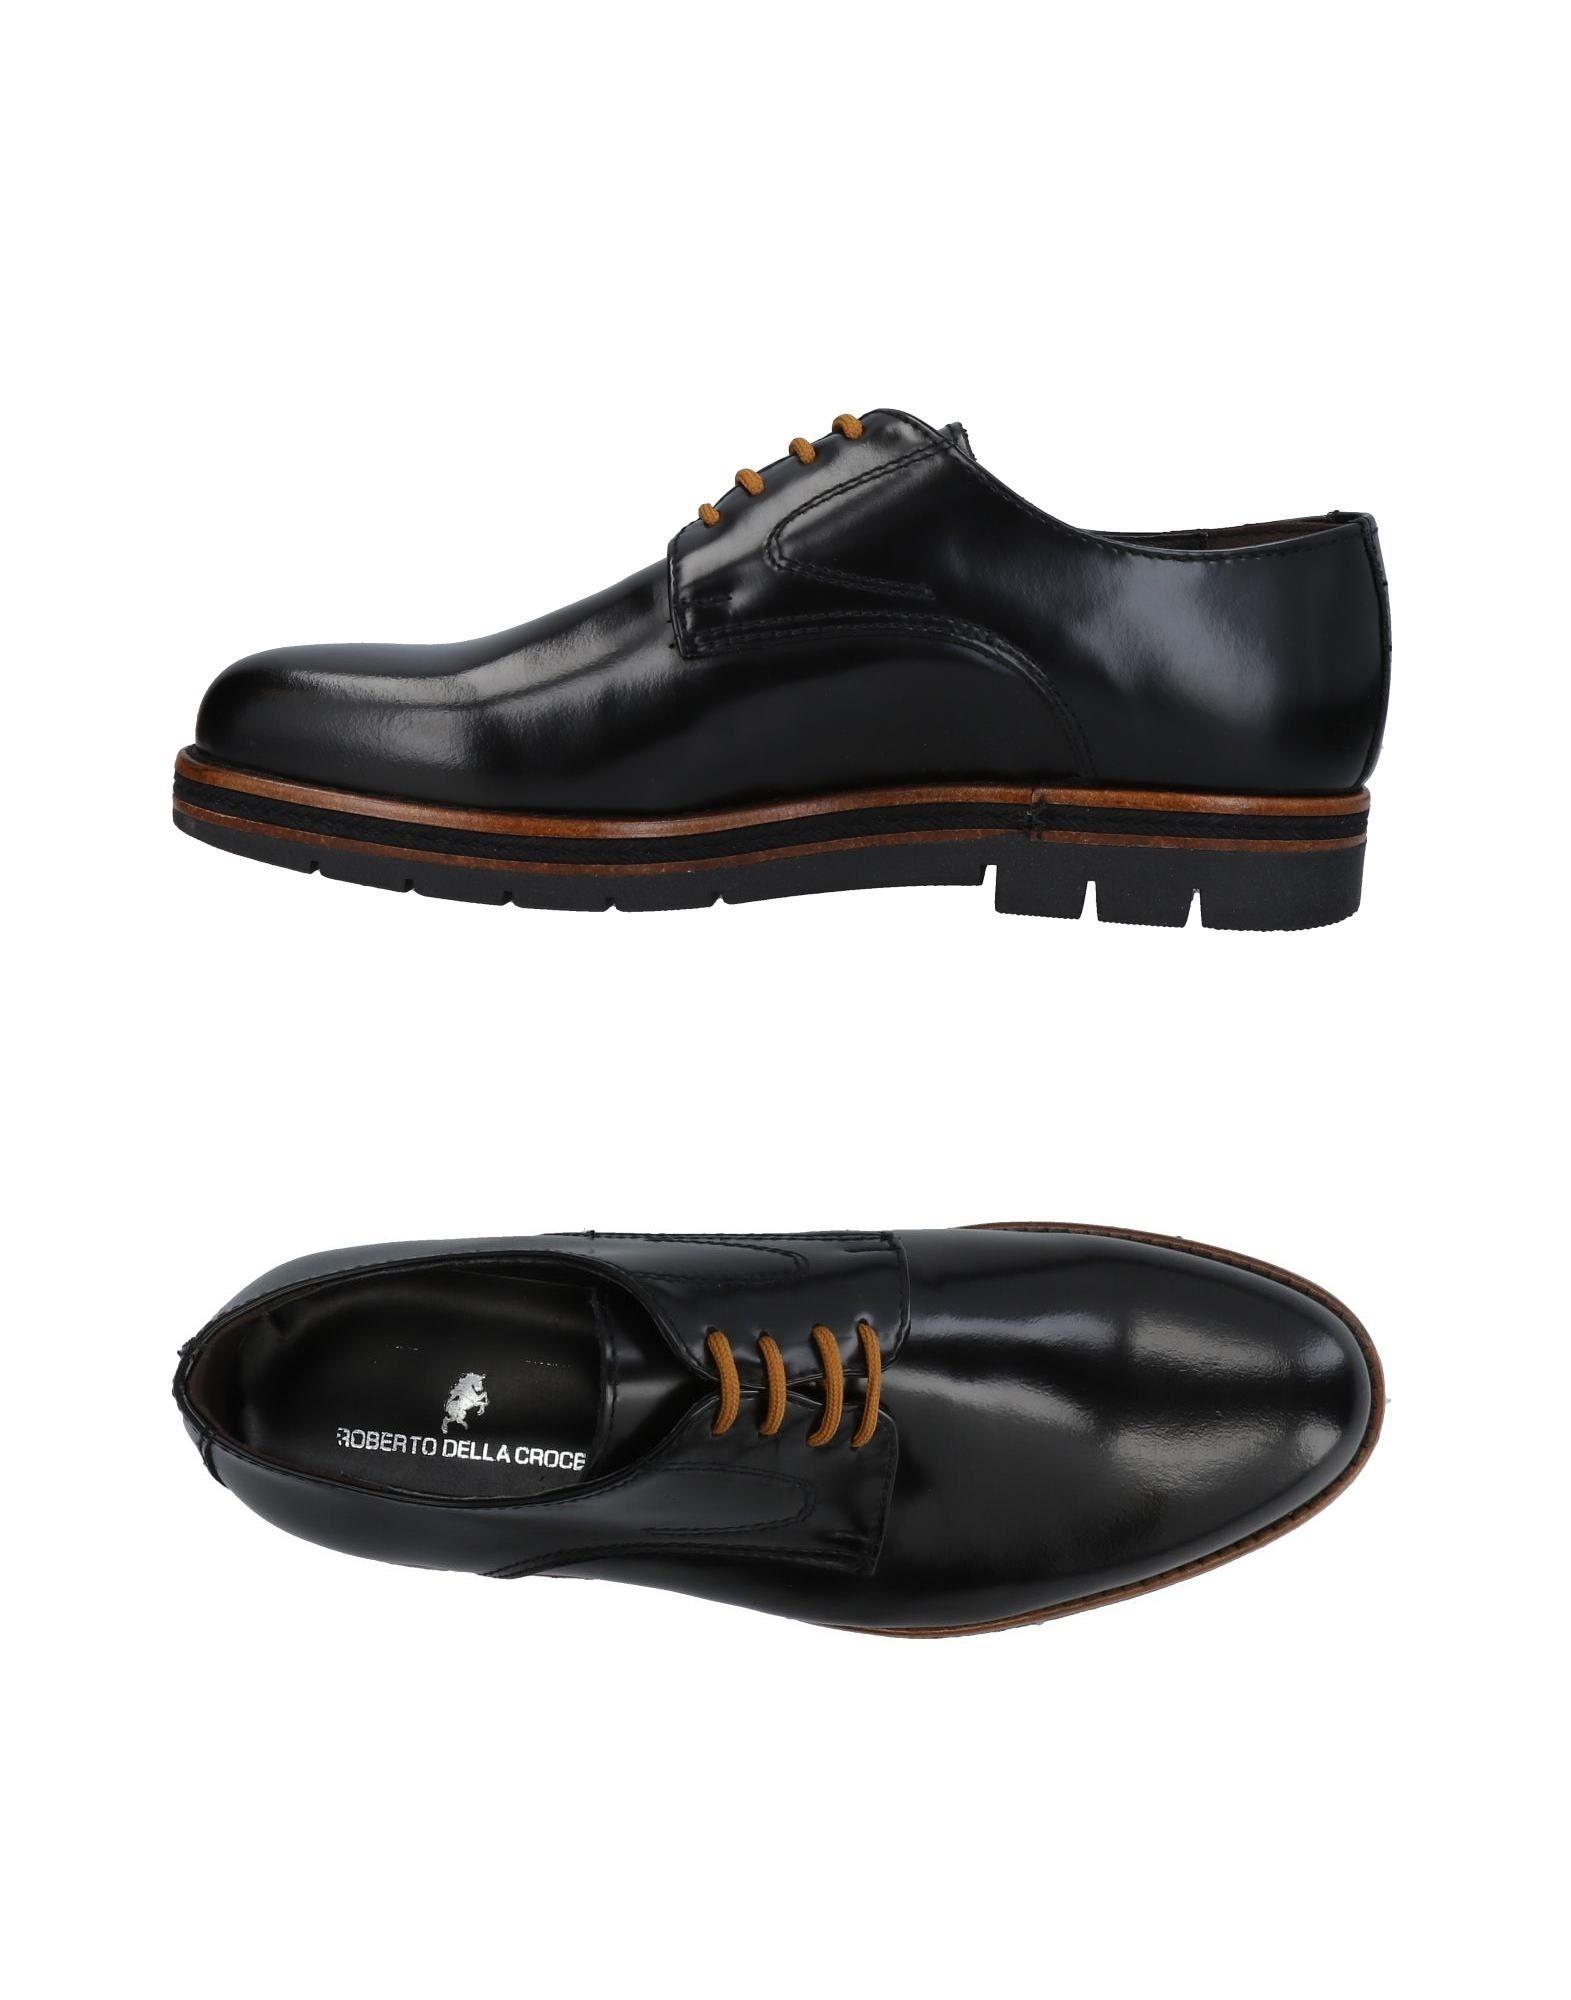 Roberto Della Croce Schnürschuhe Herren  11443413FW Neue Schuhe